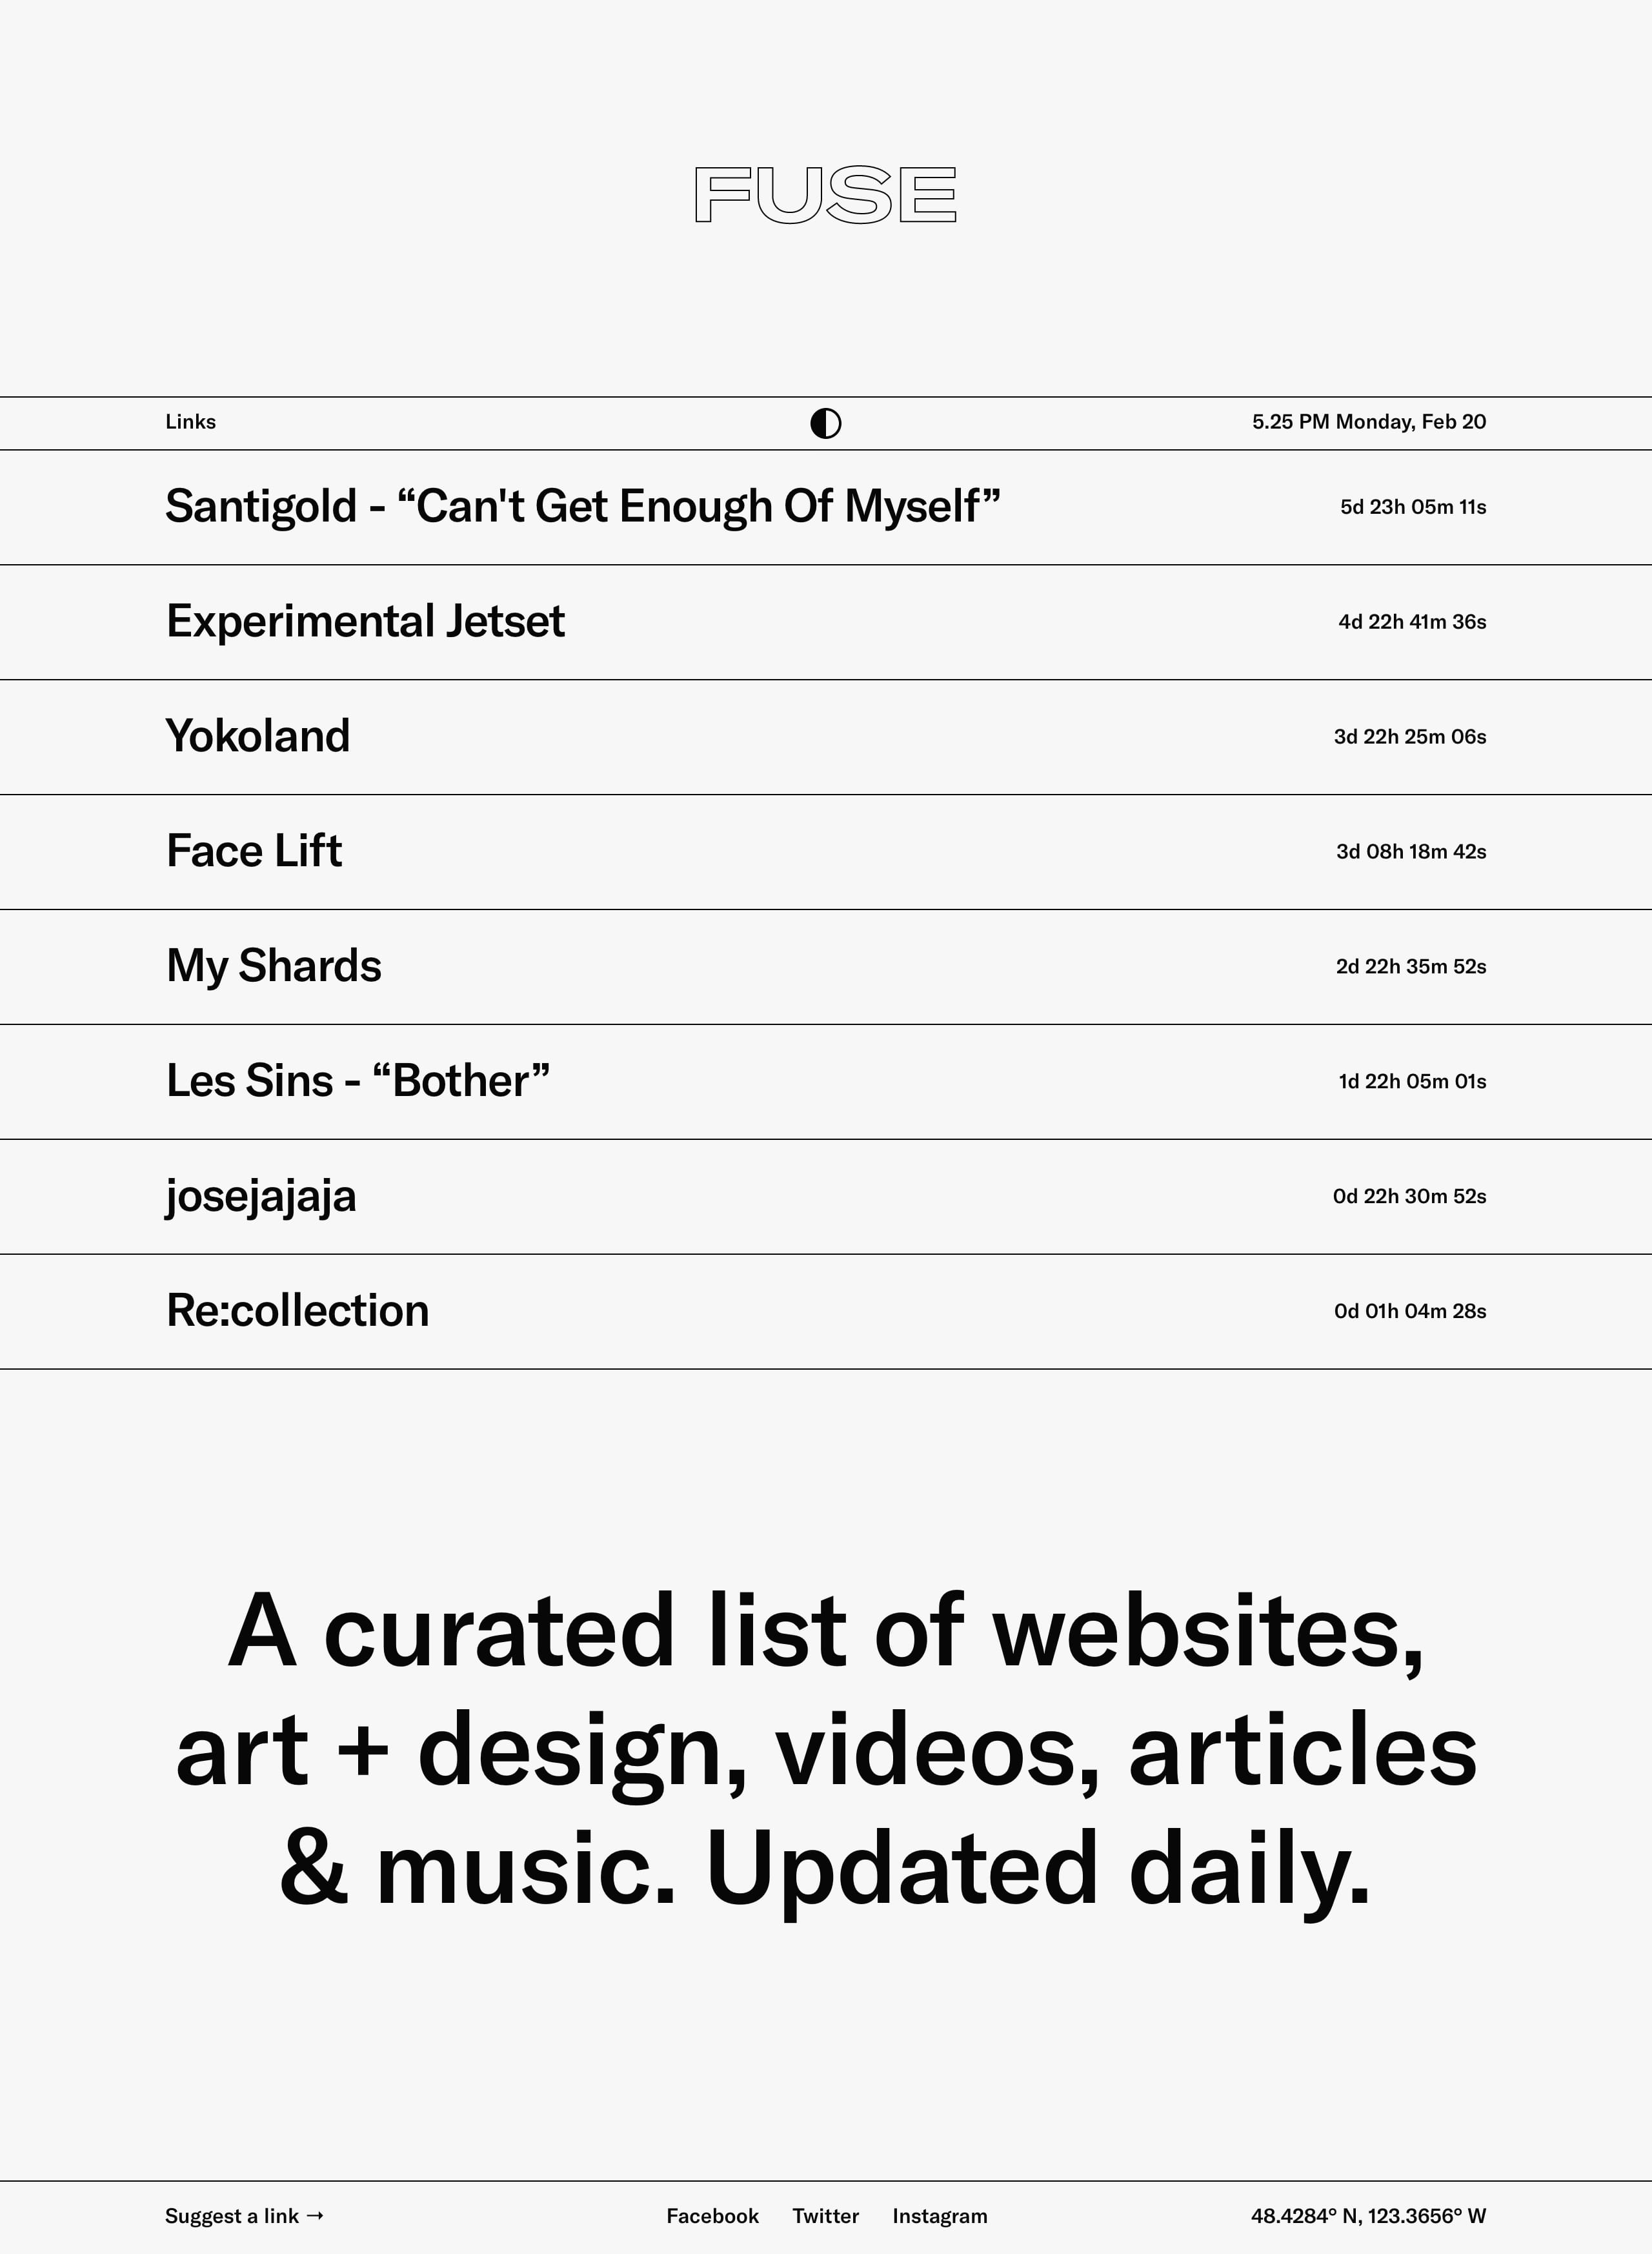 Fuse Website Screenshot